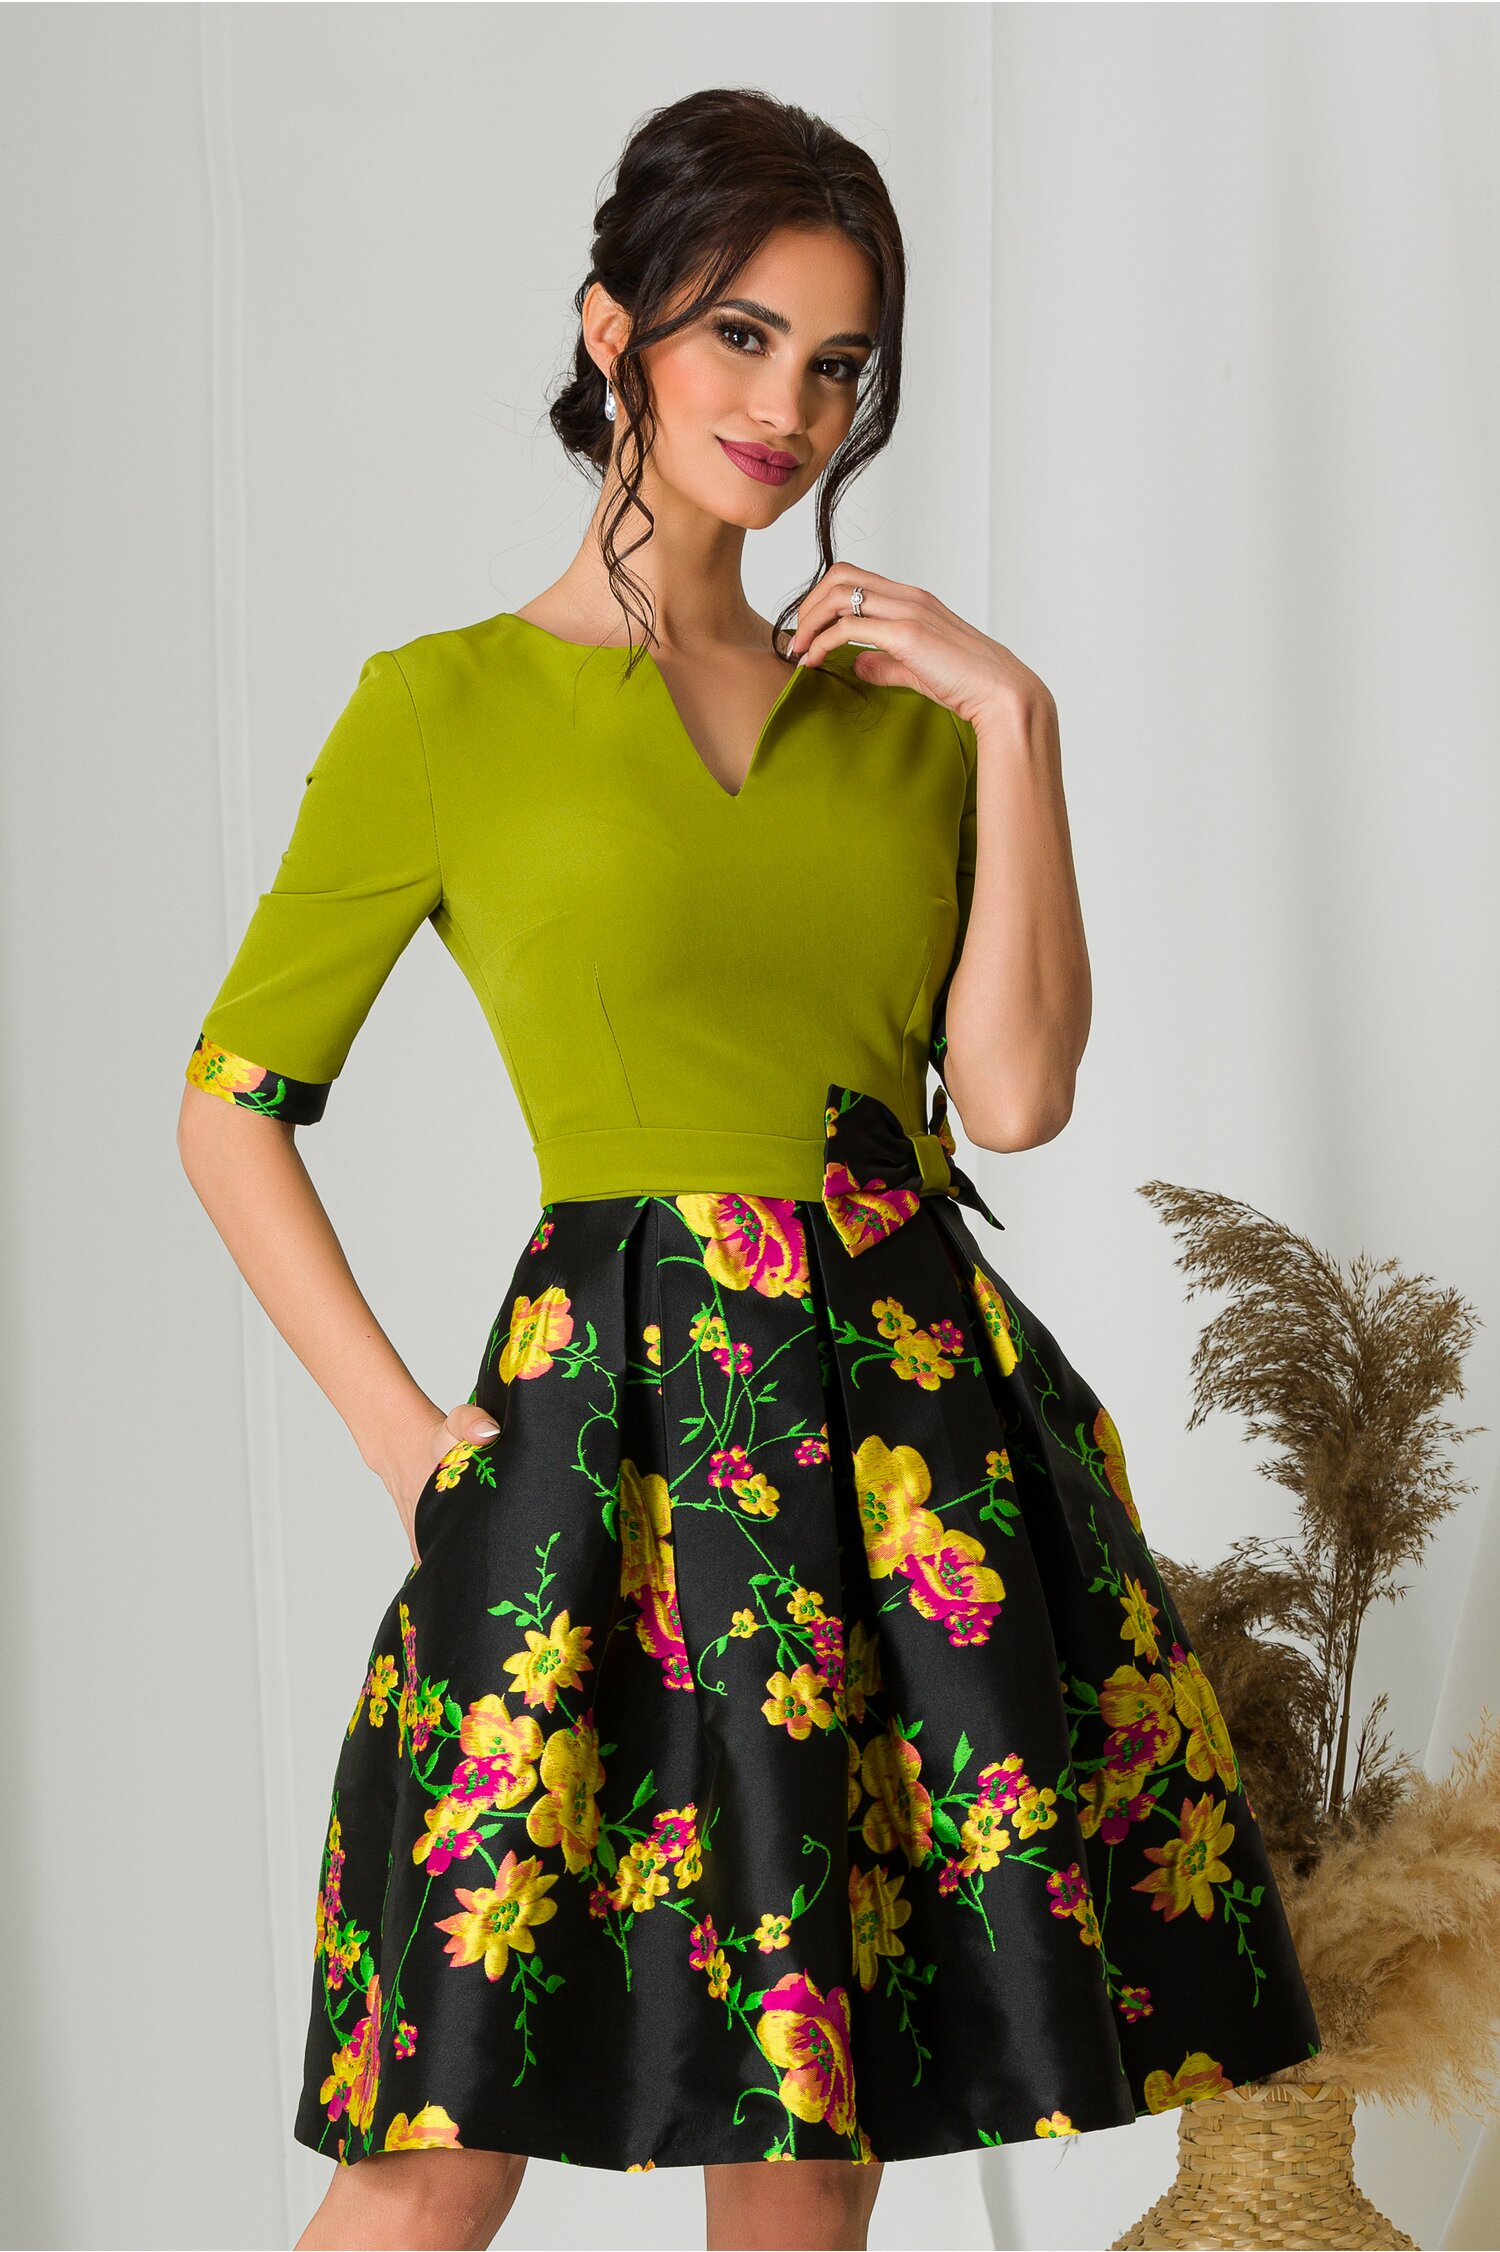 Rochie MBG cu bust verde si fusta neagra cu imprimeuri florale imagine dyfashion.ro 2021